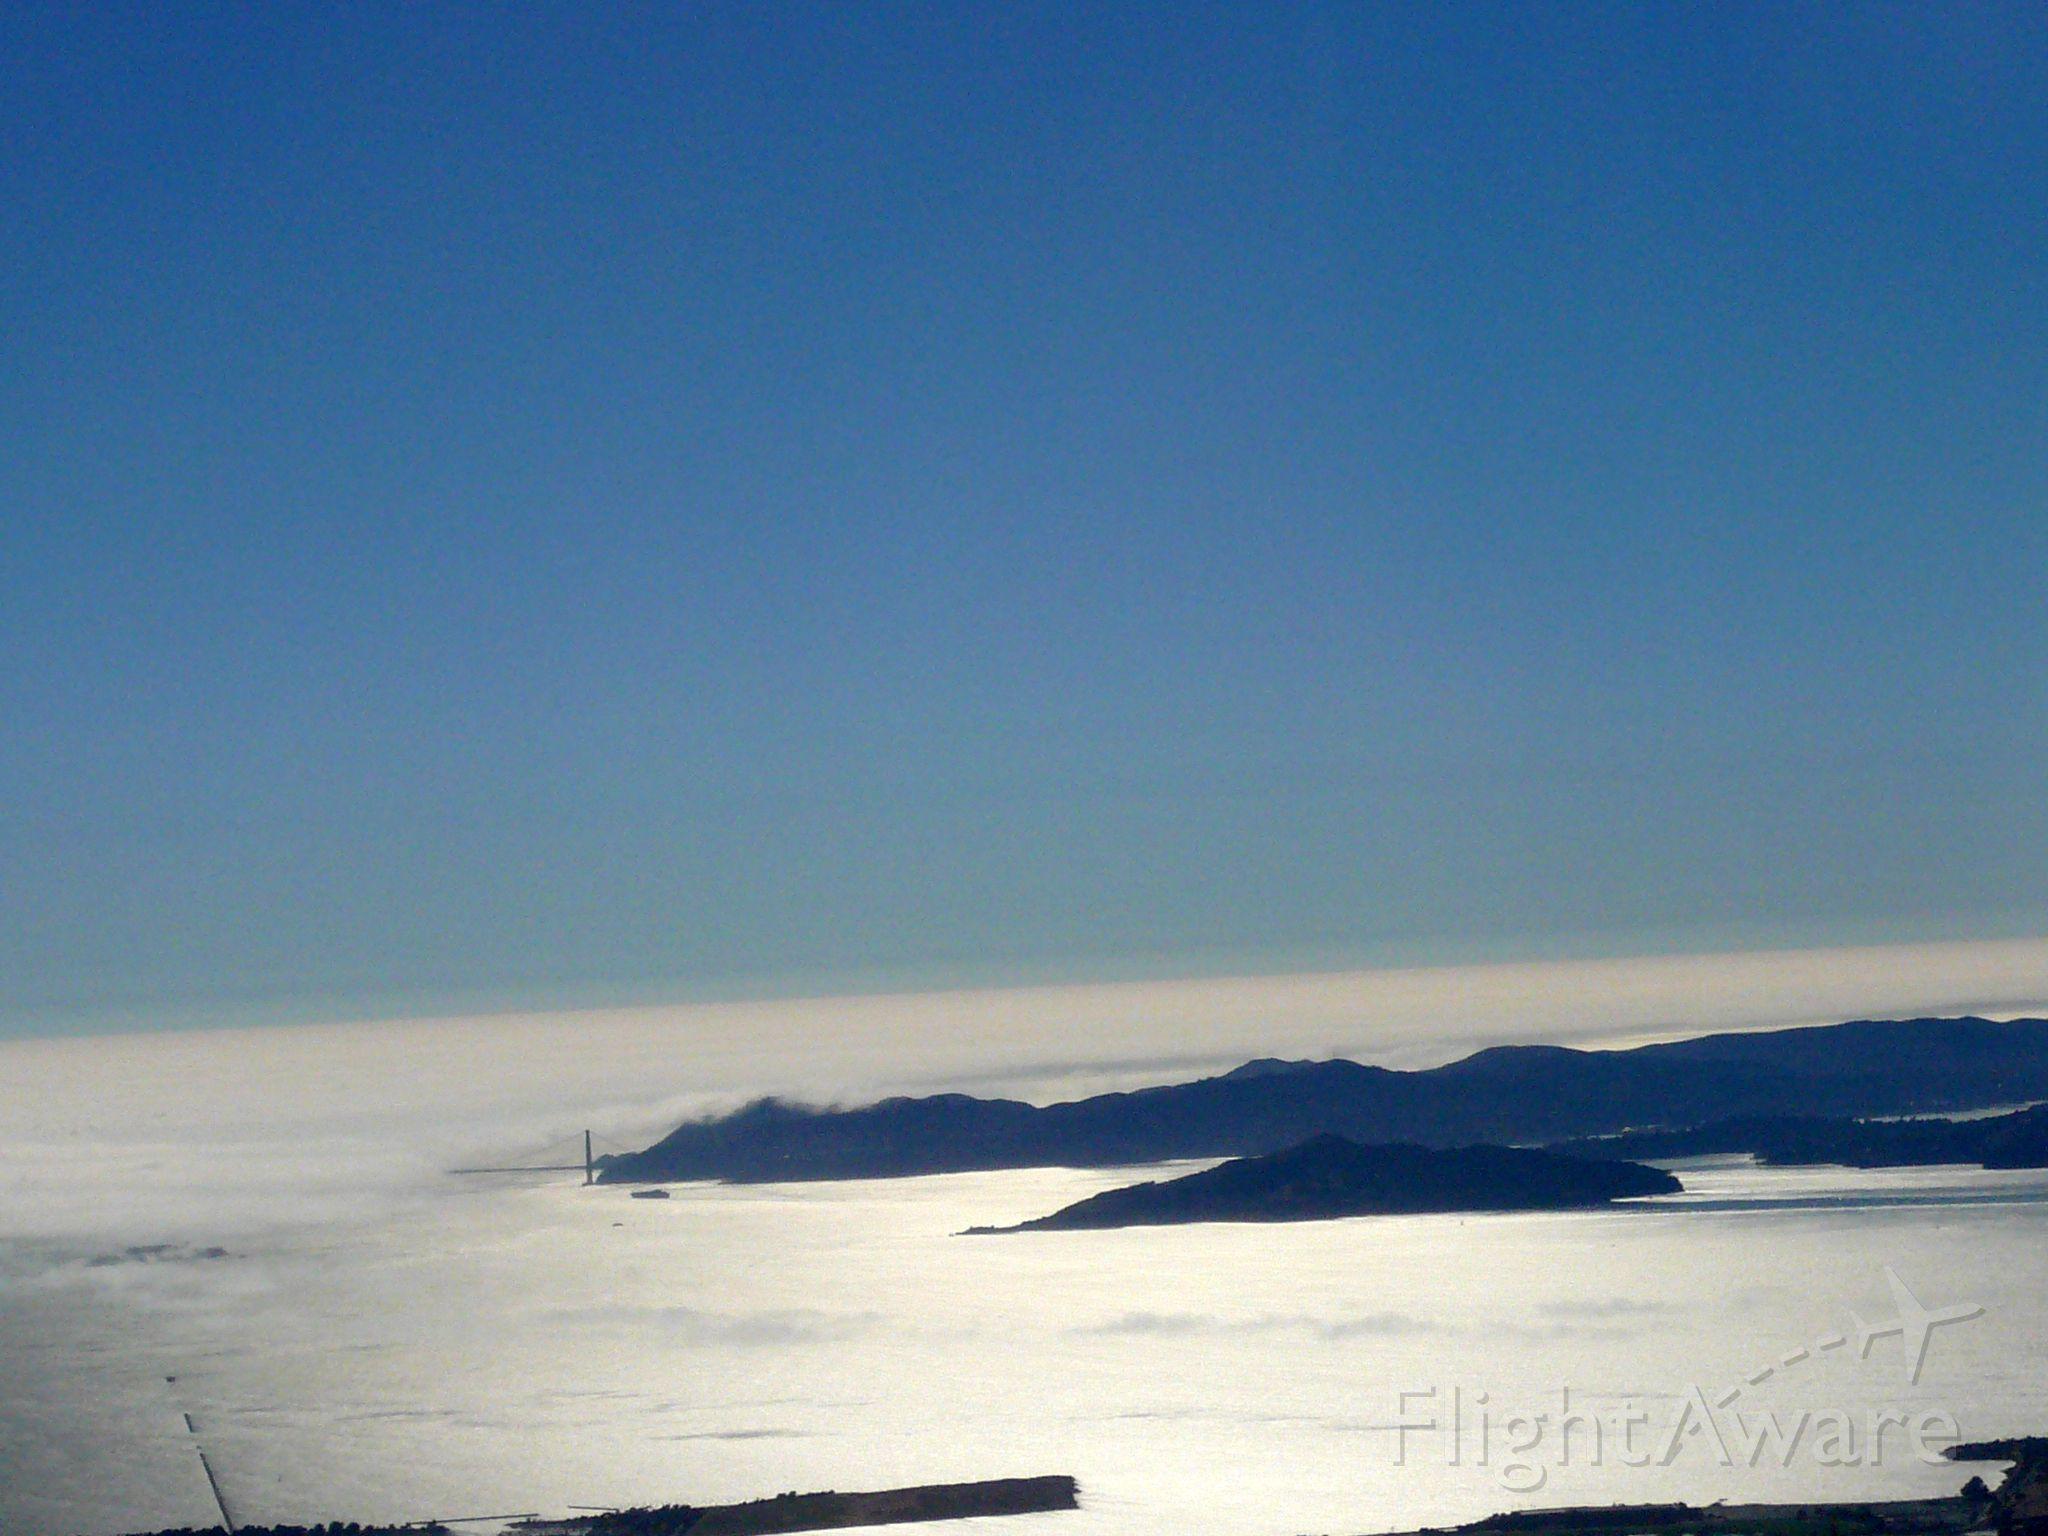 Piper Cherokee (N553TP) - Golden Gate Bridge SF Bay Area